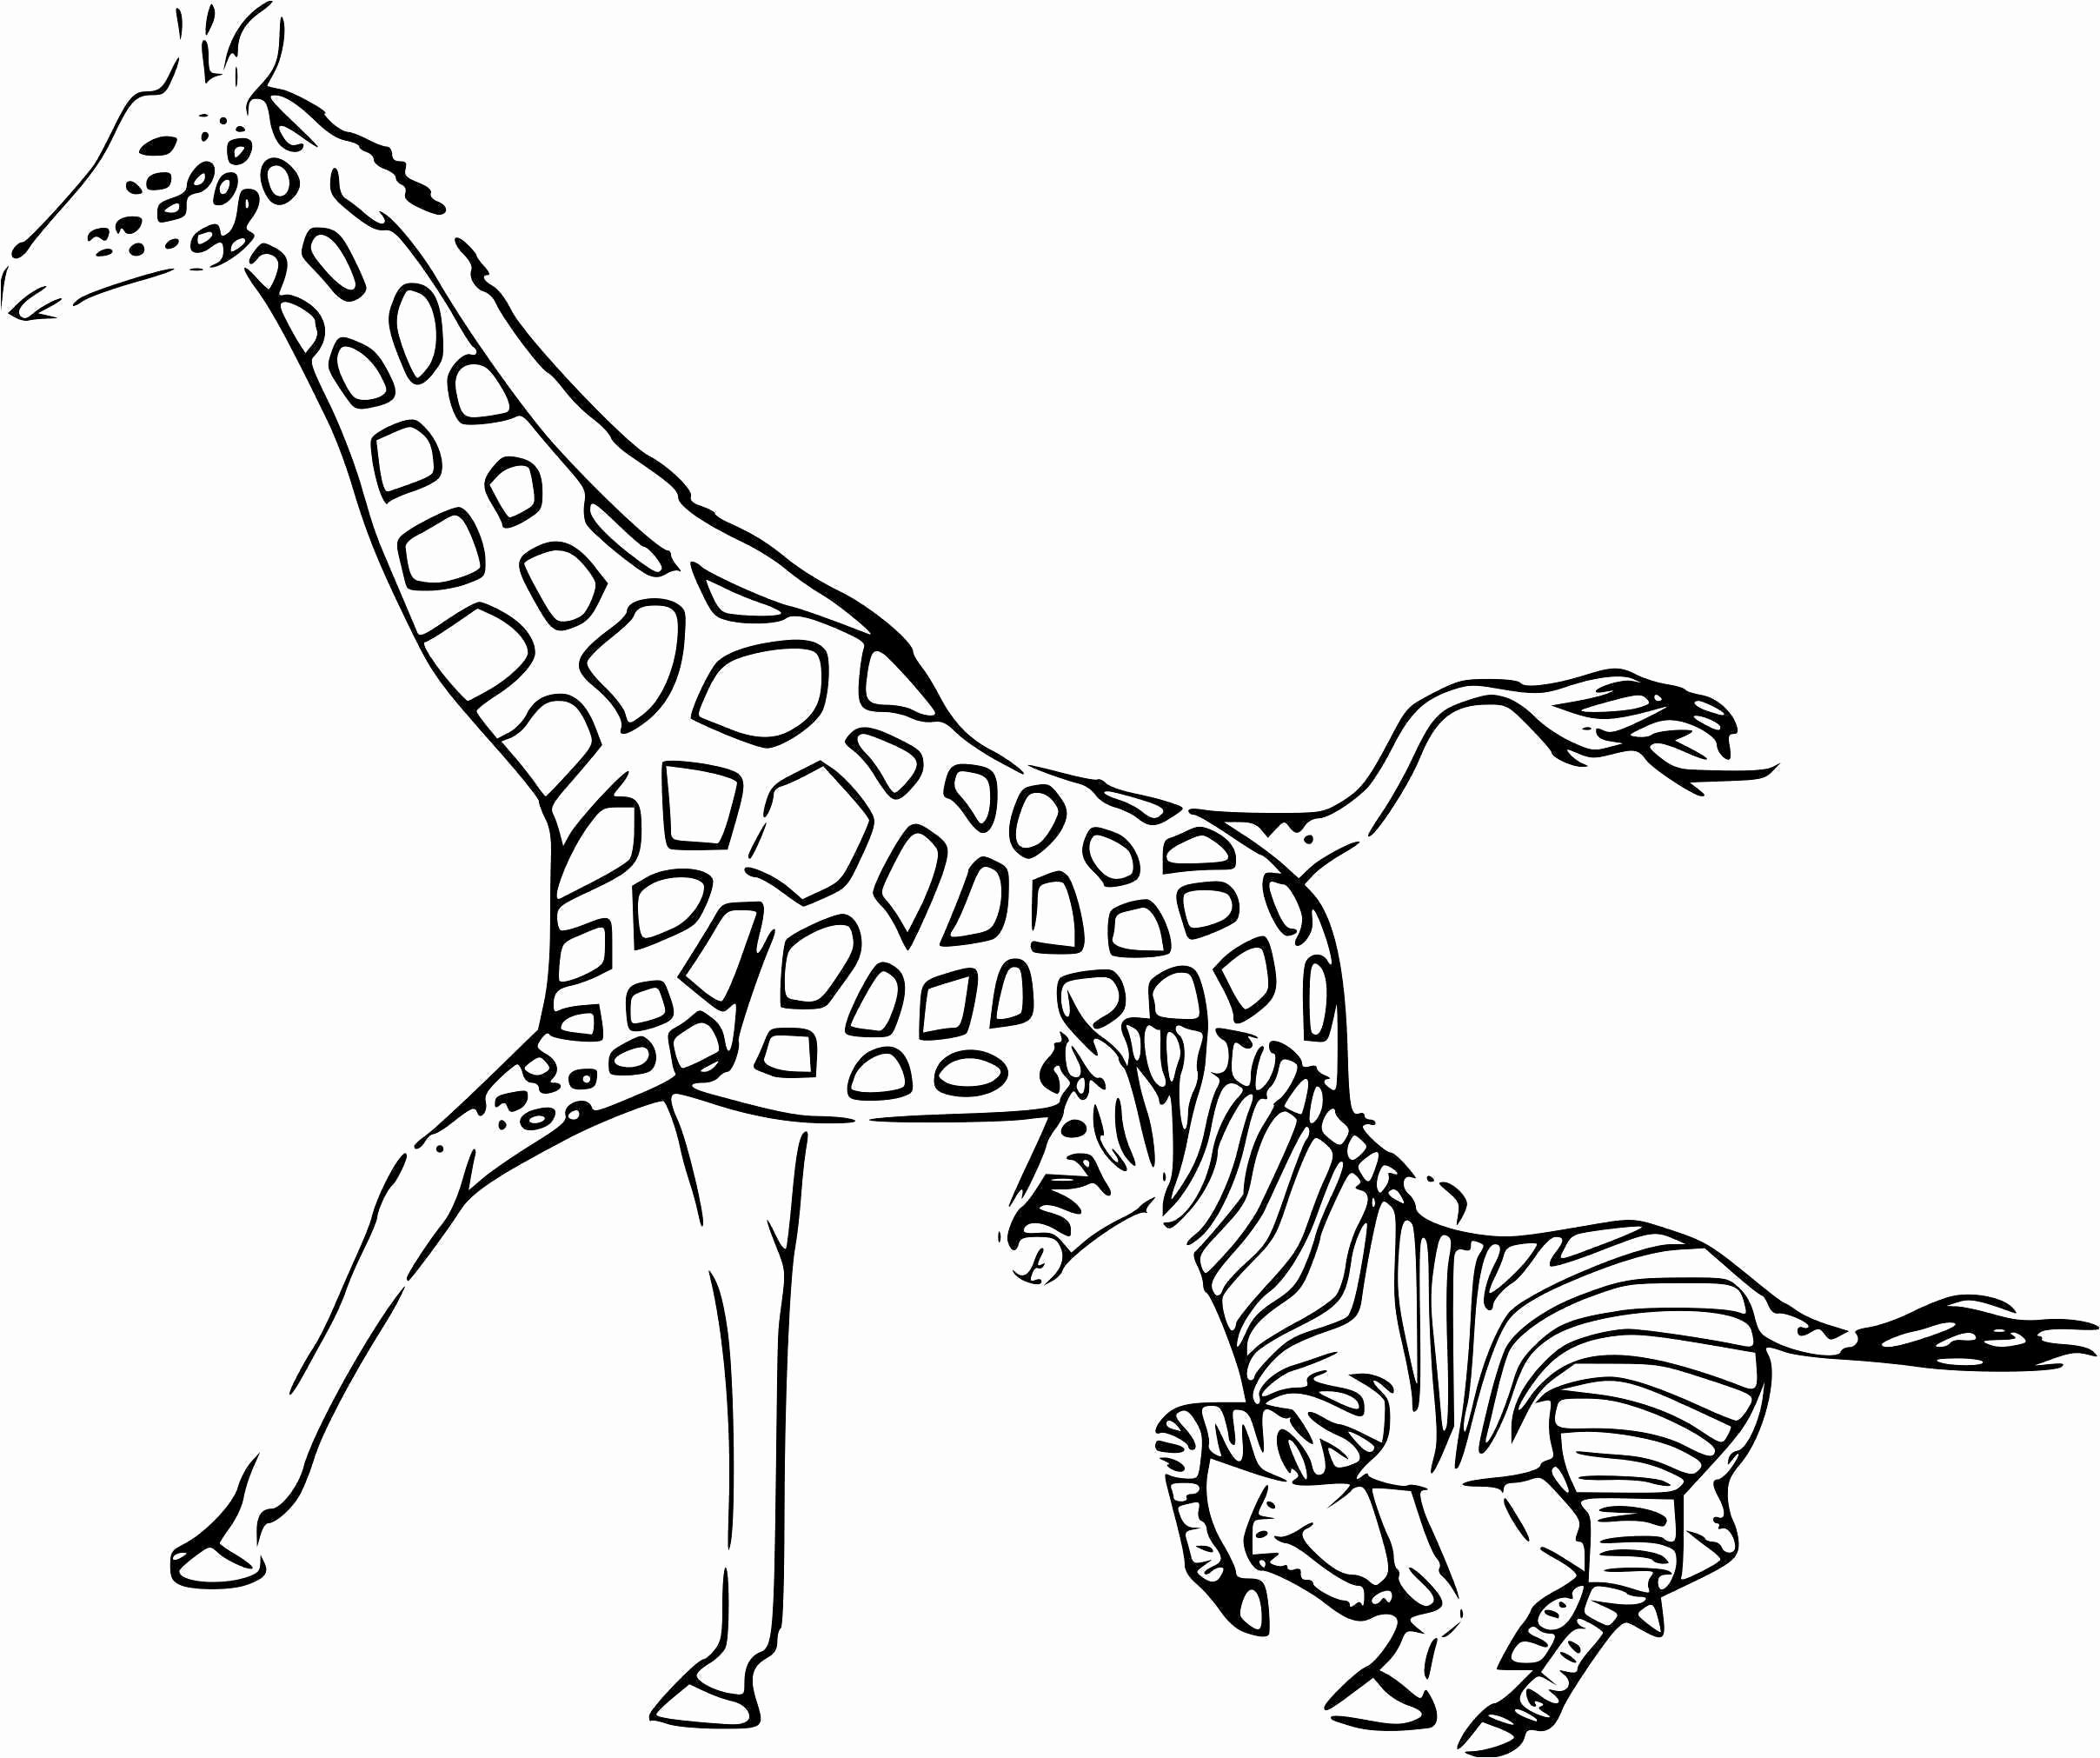 Coloriage Mandala Animaux Génial Luxury Coloriage Mandala avec Coloriage Girafe A Imprimer Gratuit